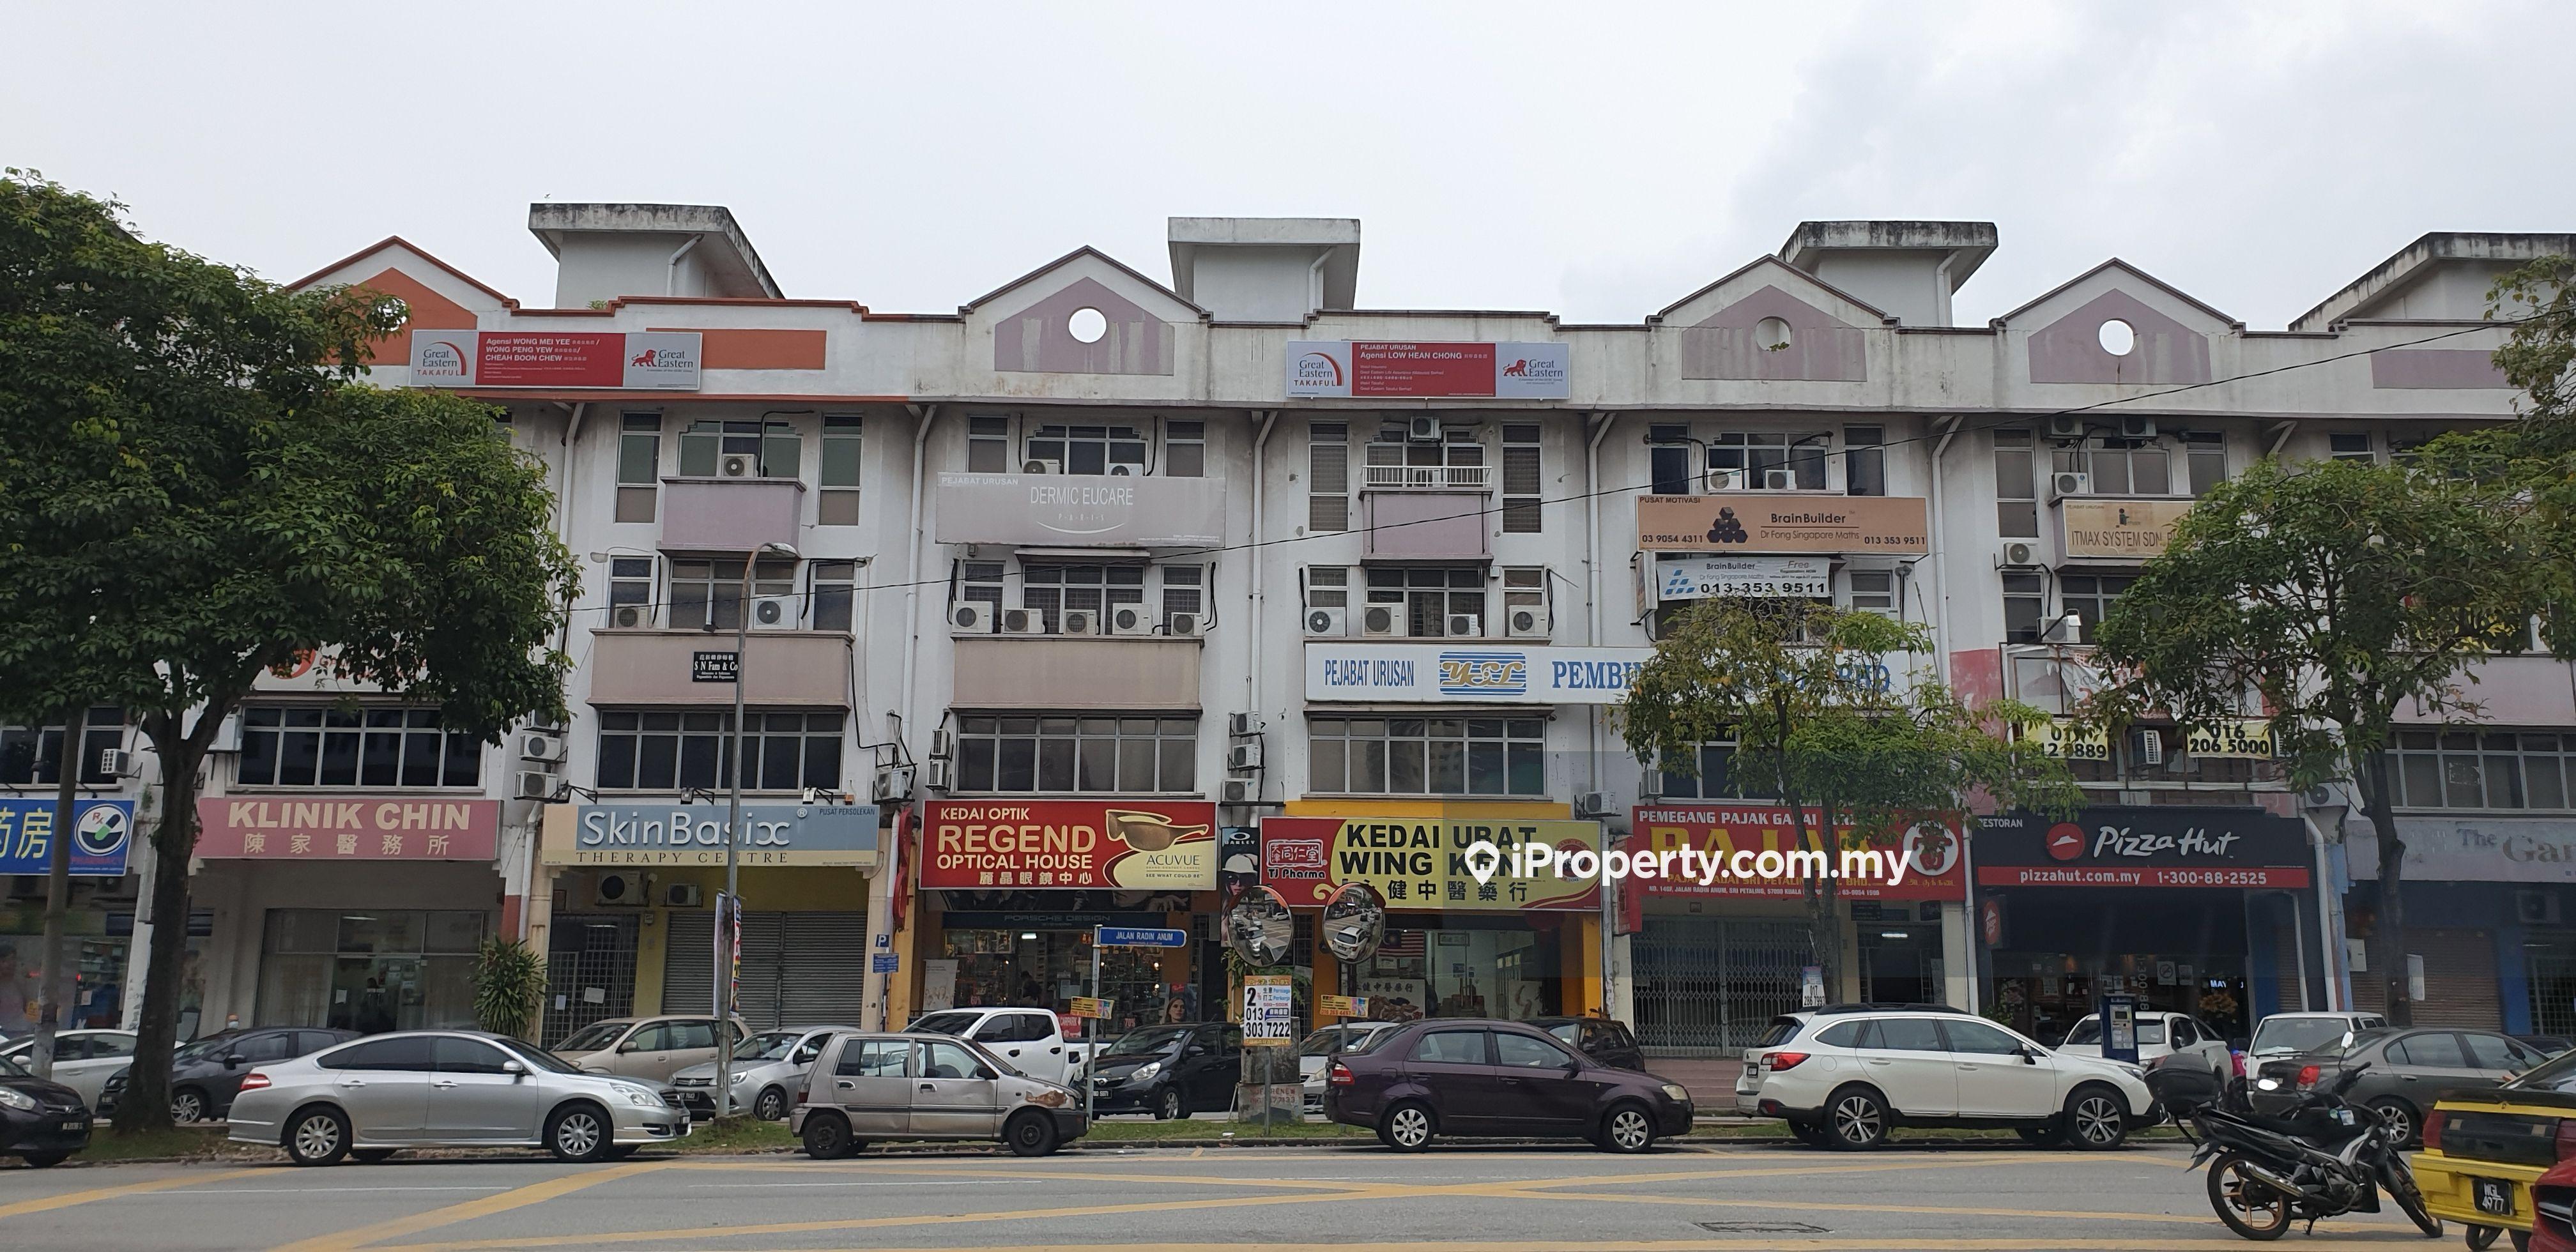 Above Pizzahut-perfect landmark, Sri Petaling